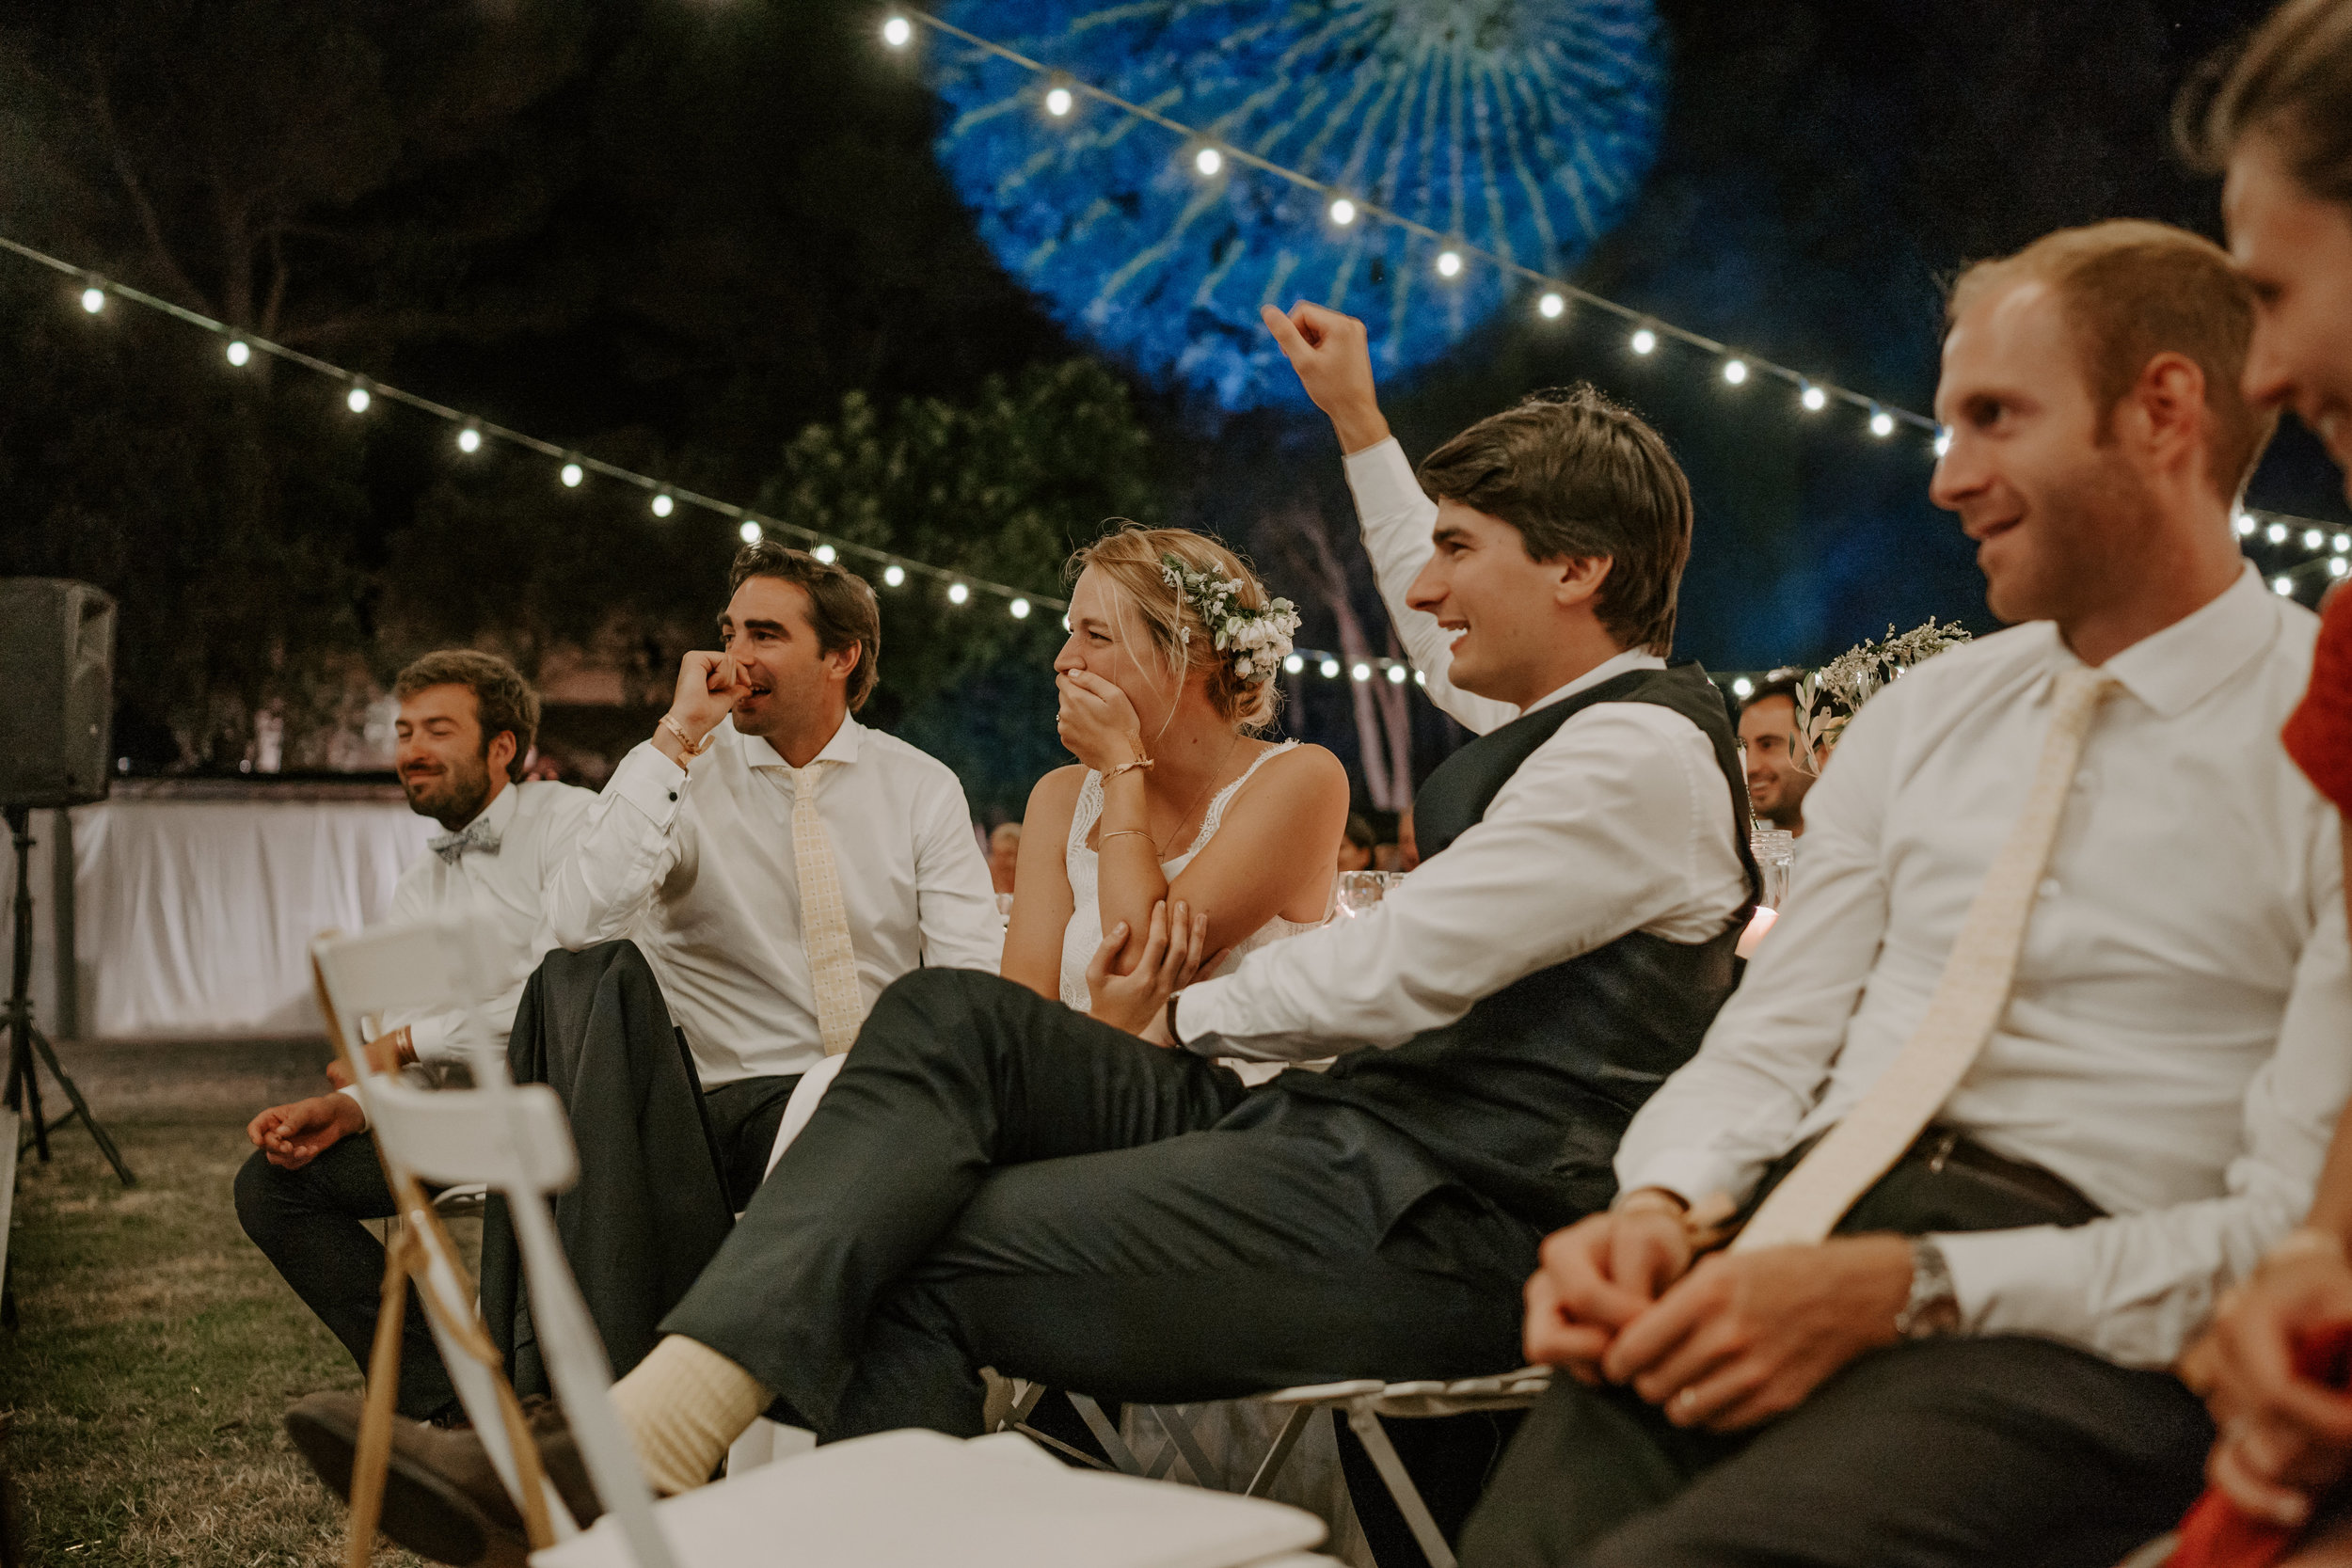 elsacaza_photographe_mariage_Juliette_Nicolas-857.jpg